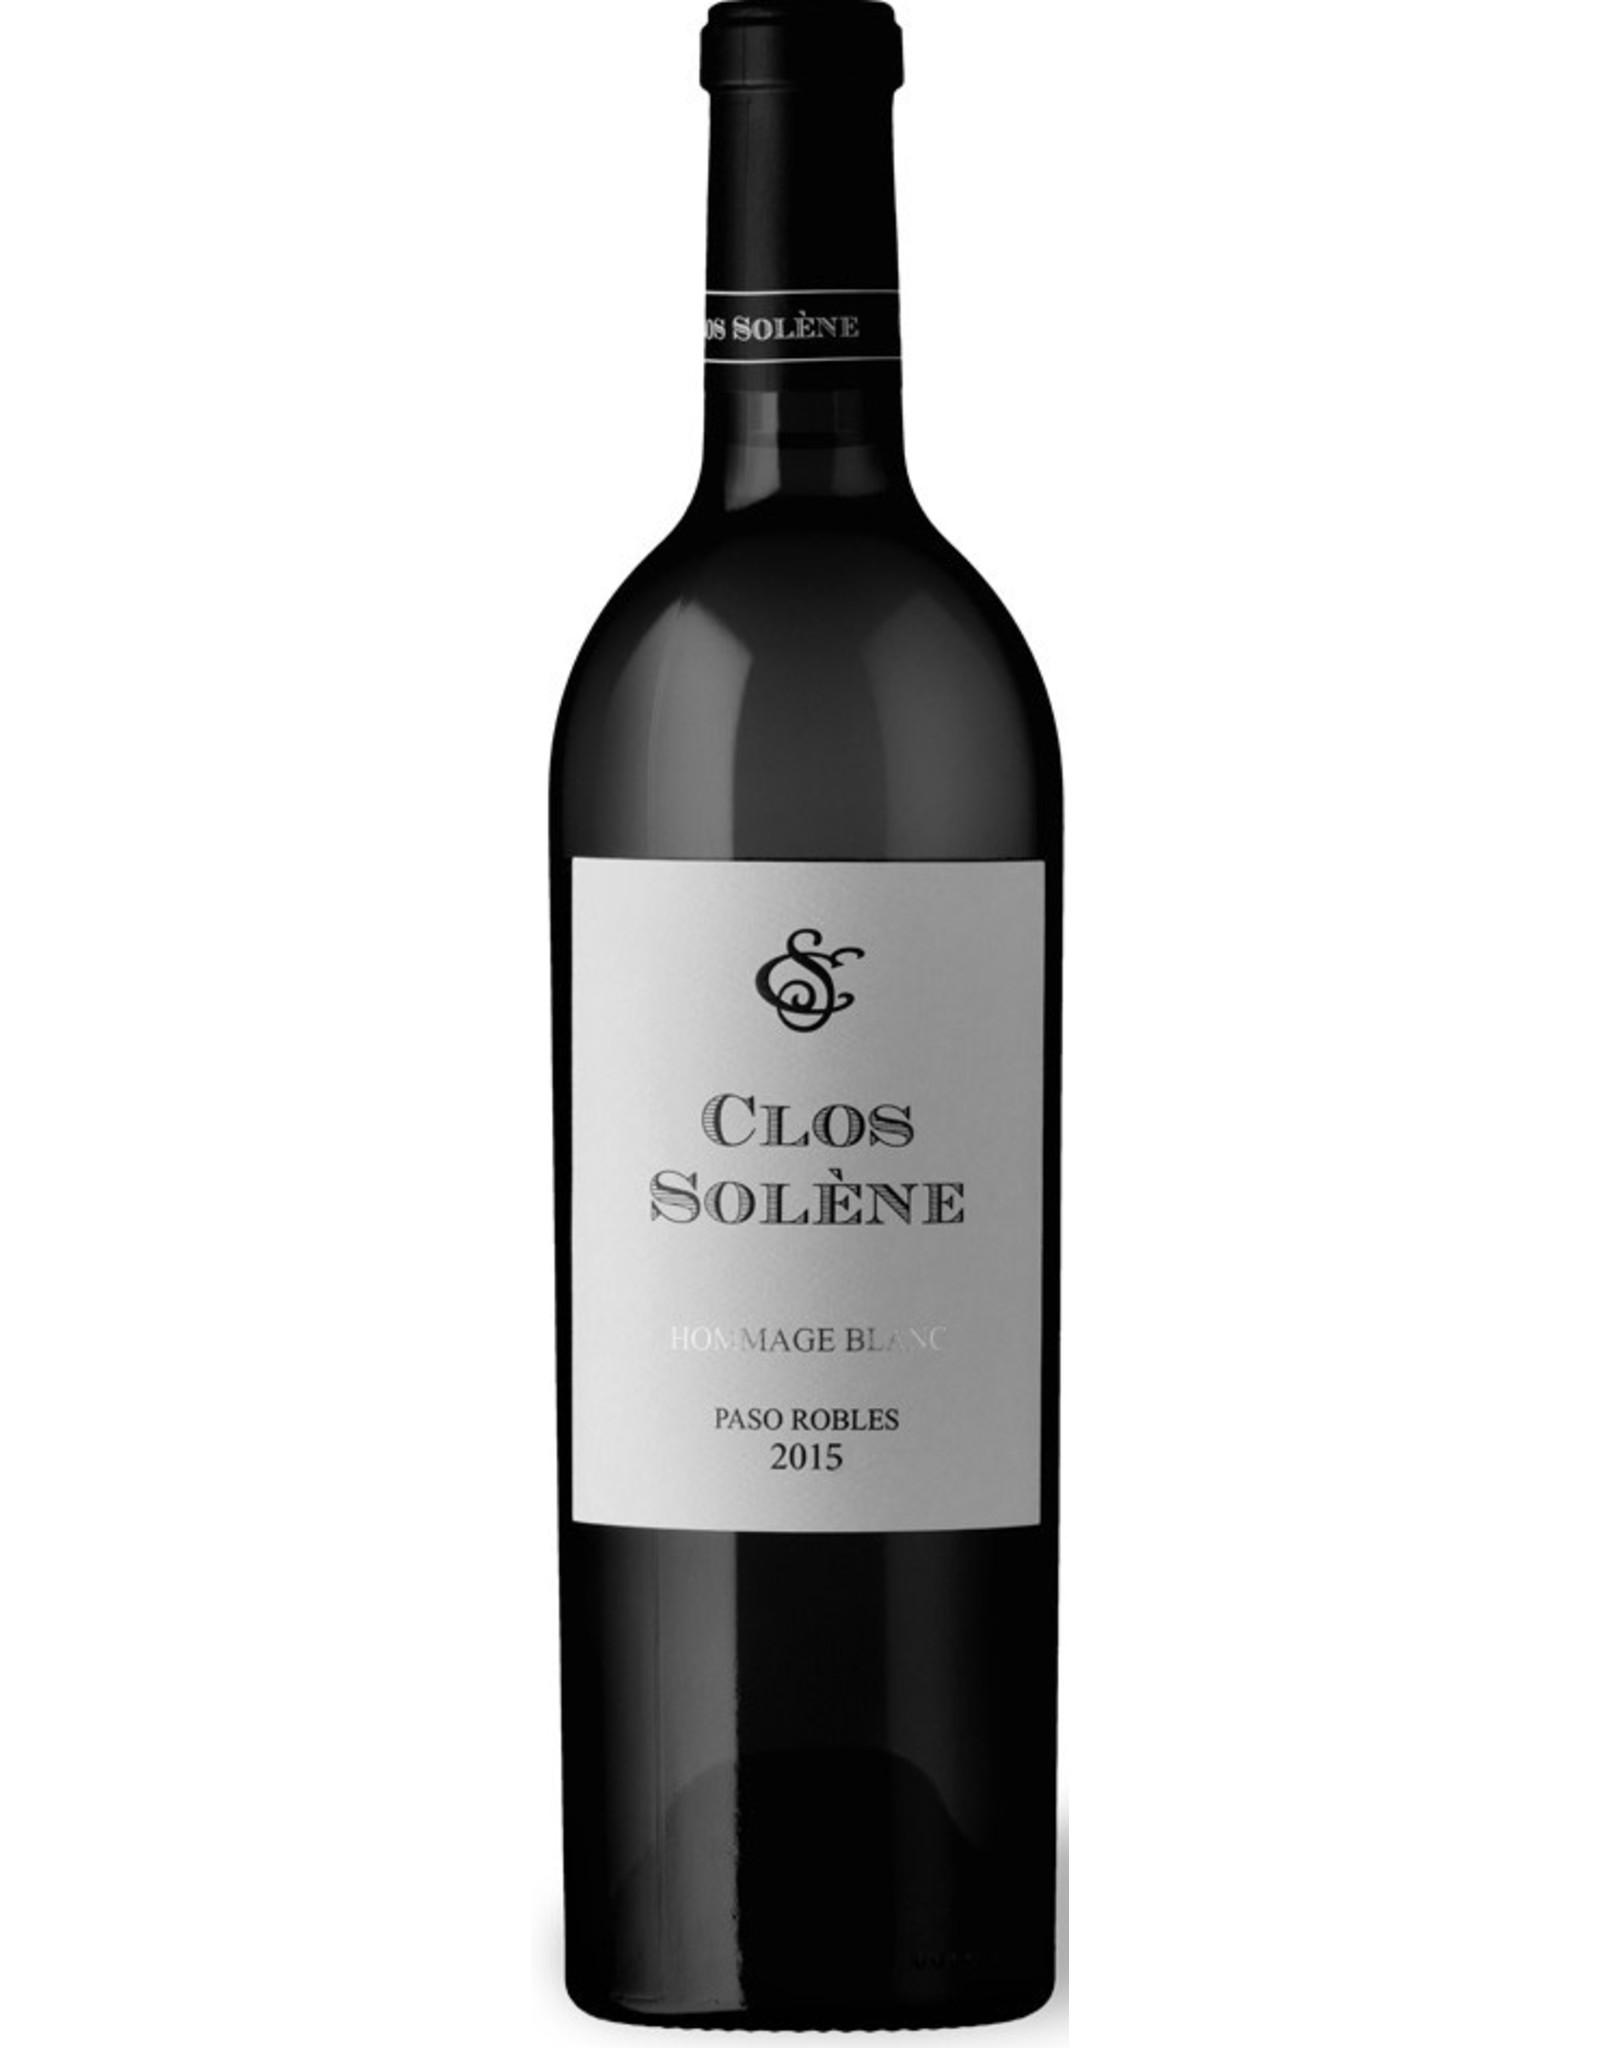 White Wine 2015, Clos Solene Hommage Blanc, White Rhone Blend, Paso Robles, Central Coast, California, 14.6% Alc, CT94